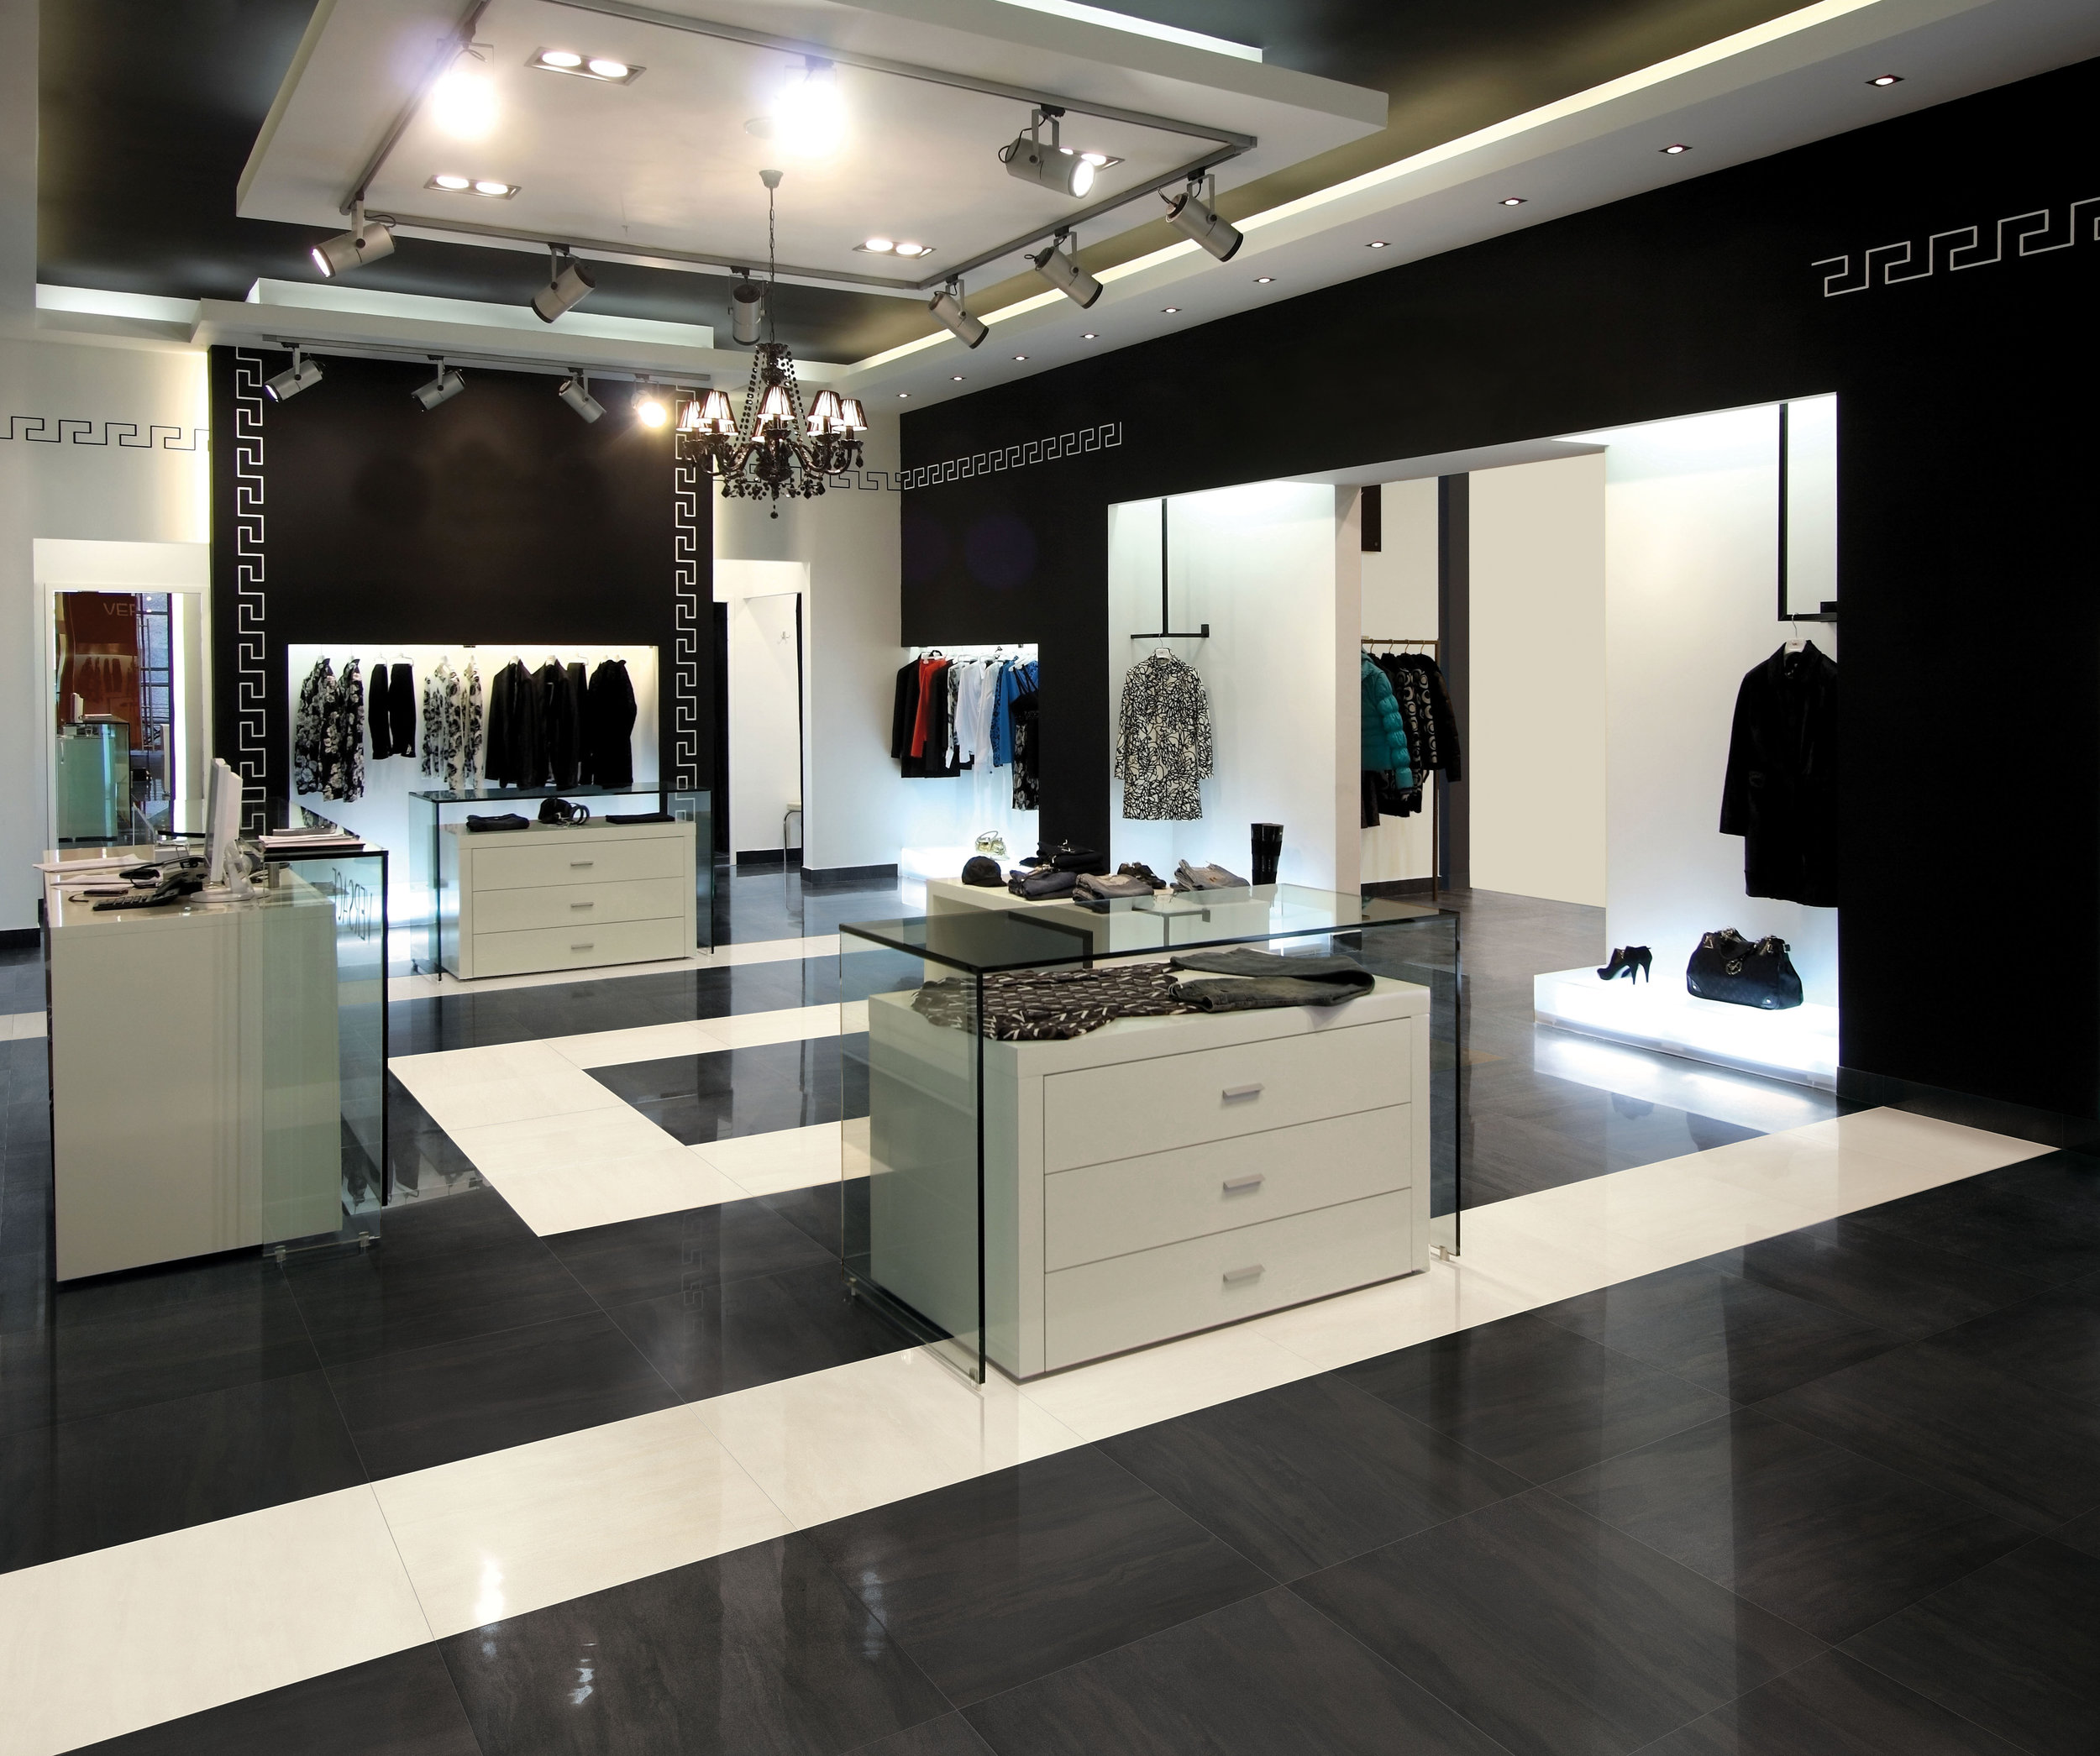 amb.negozio60x60.jpg